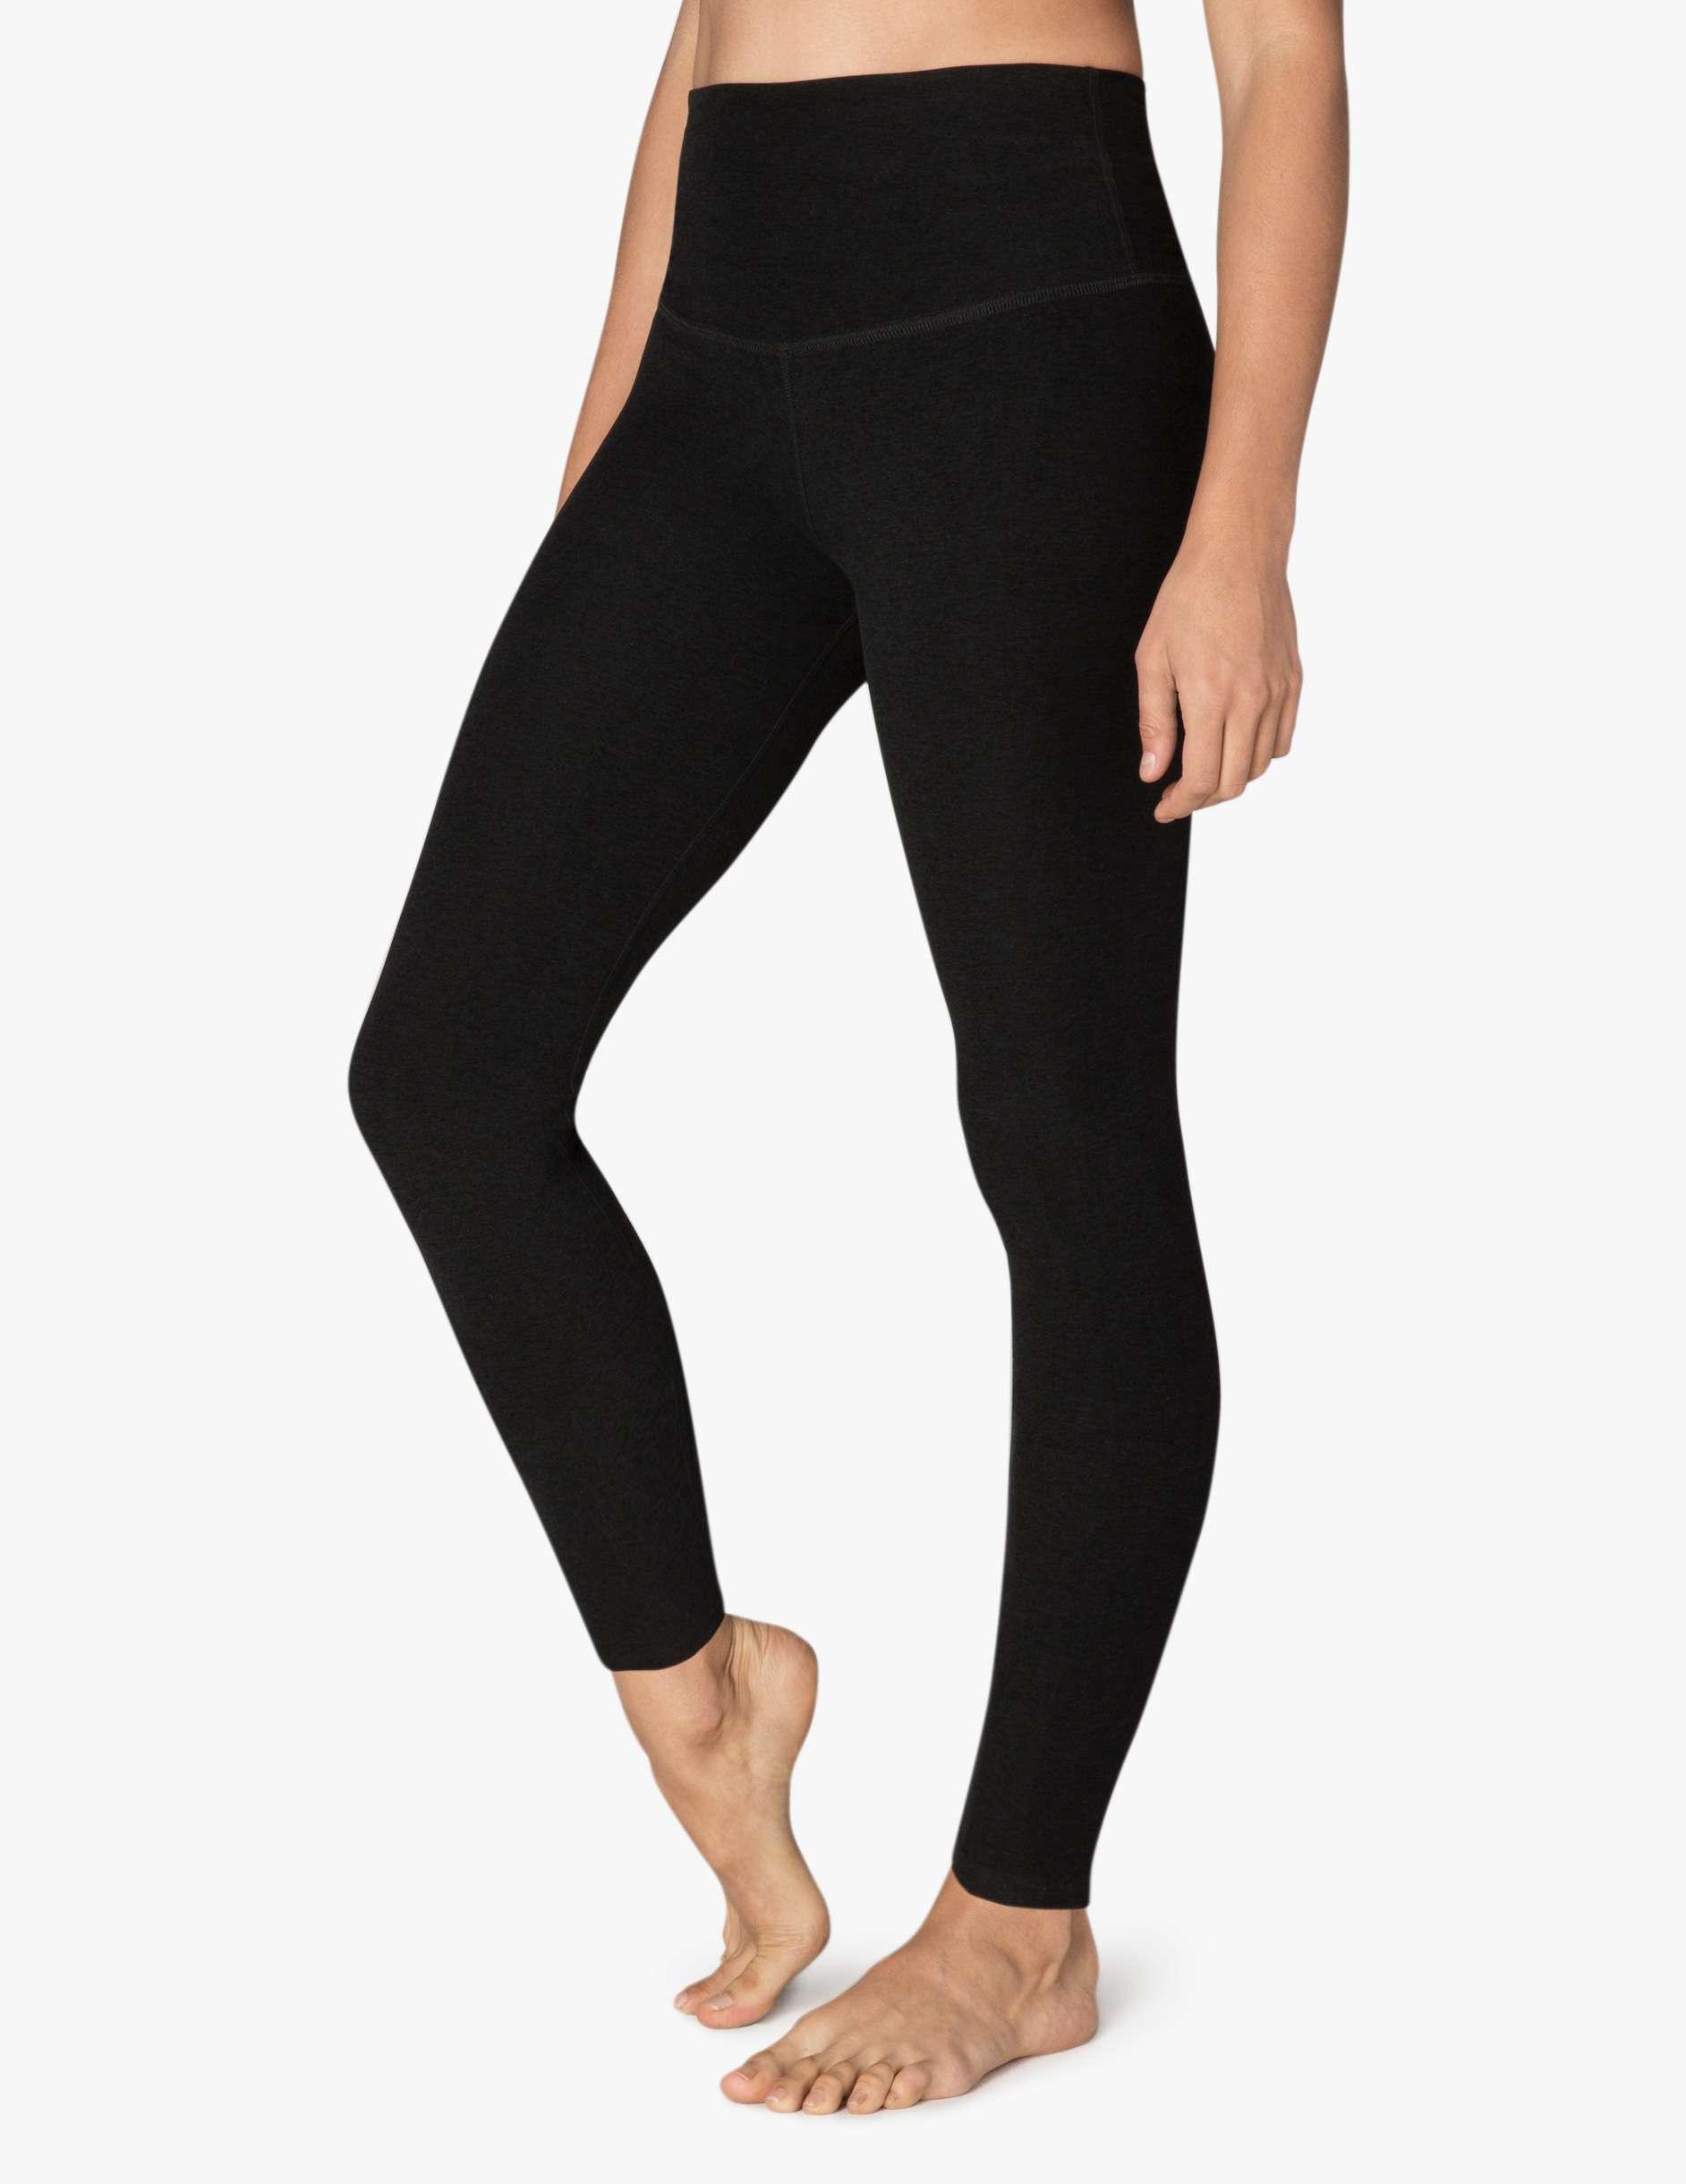 Beyond Yoga Spacedye High Waist Yoga leggings full length darkest night